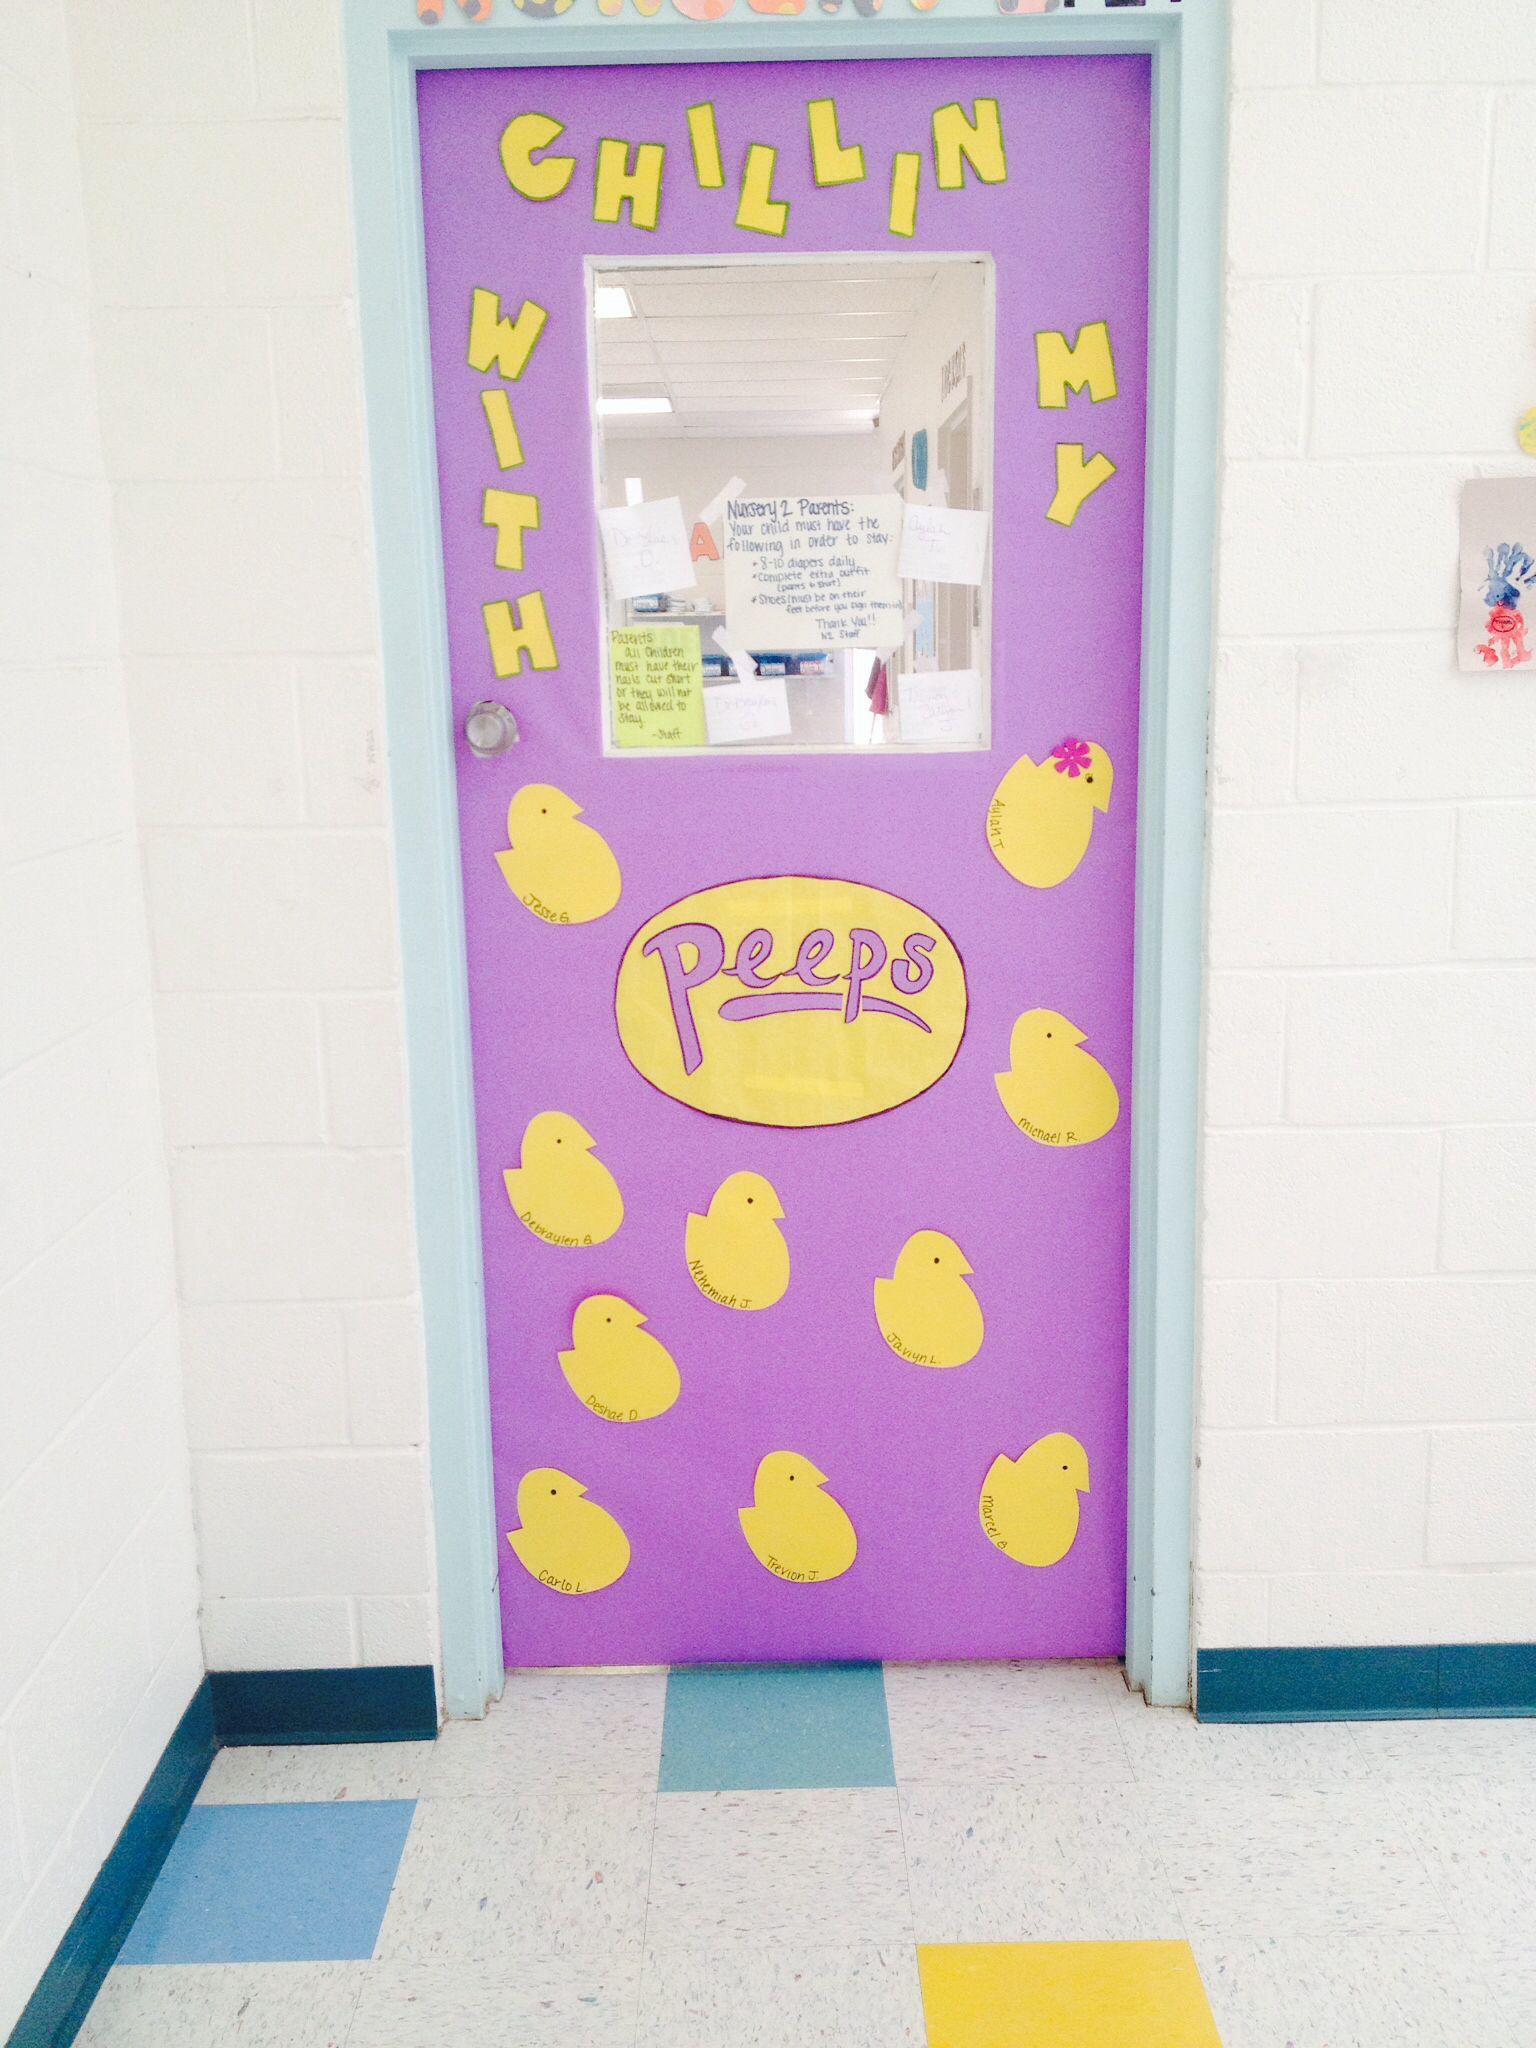 Chillin with my peeps! Easter/April classroom door